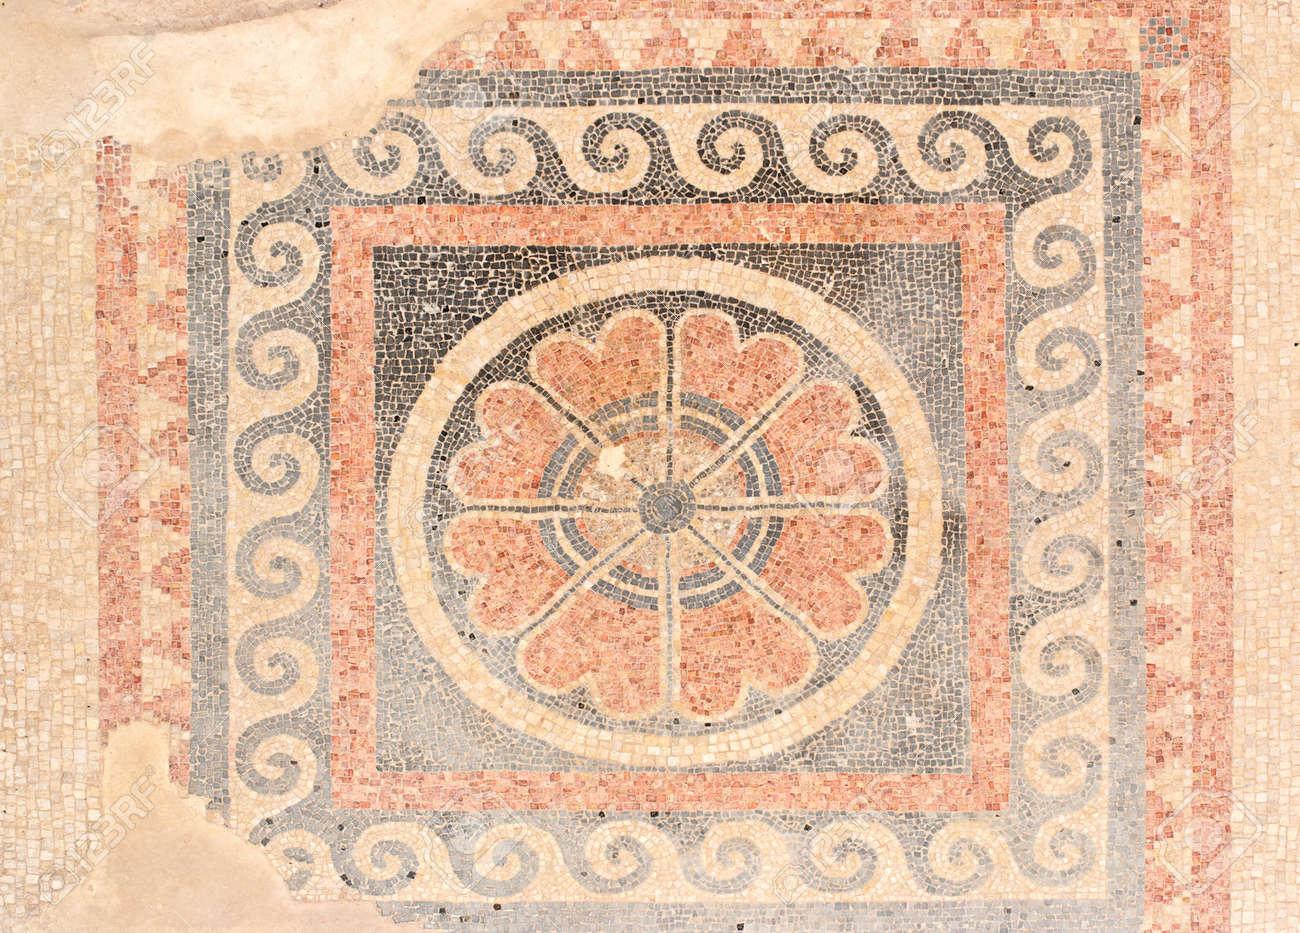 Fußboden König ~ Antikes mosaik fußboden aus könig herodes palast in masada